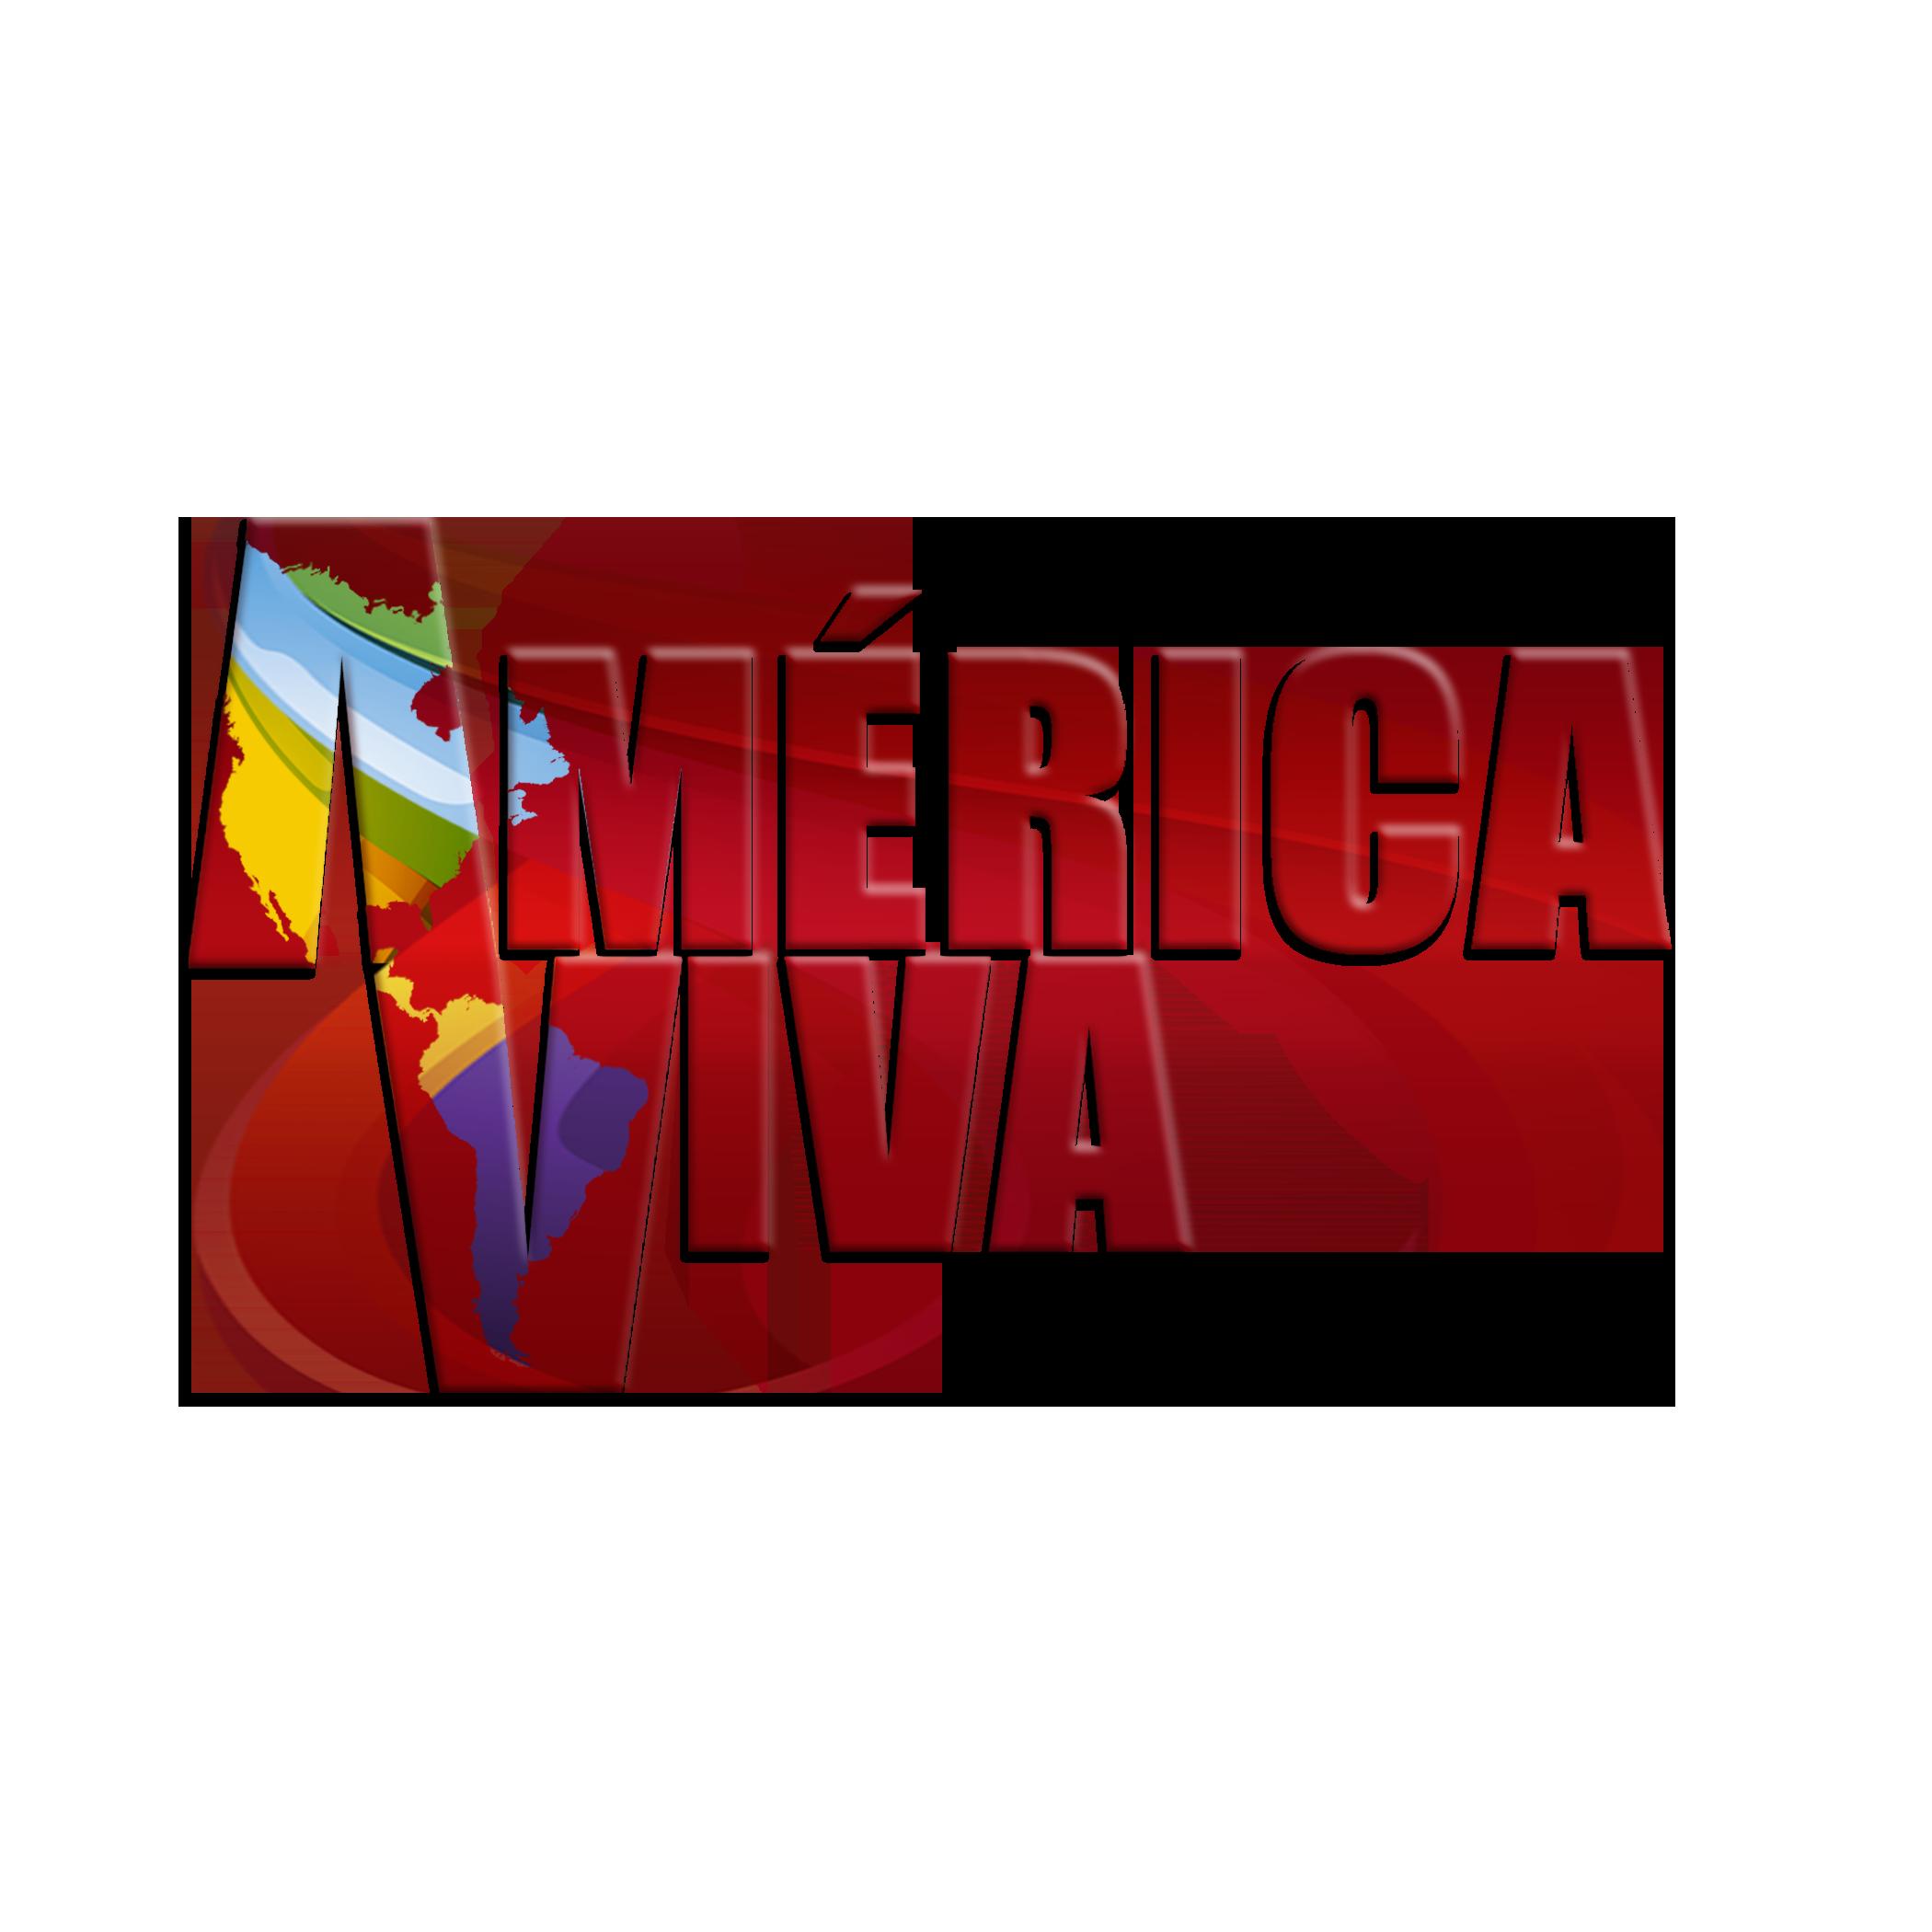 America viva